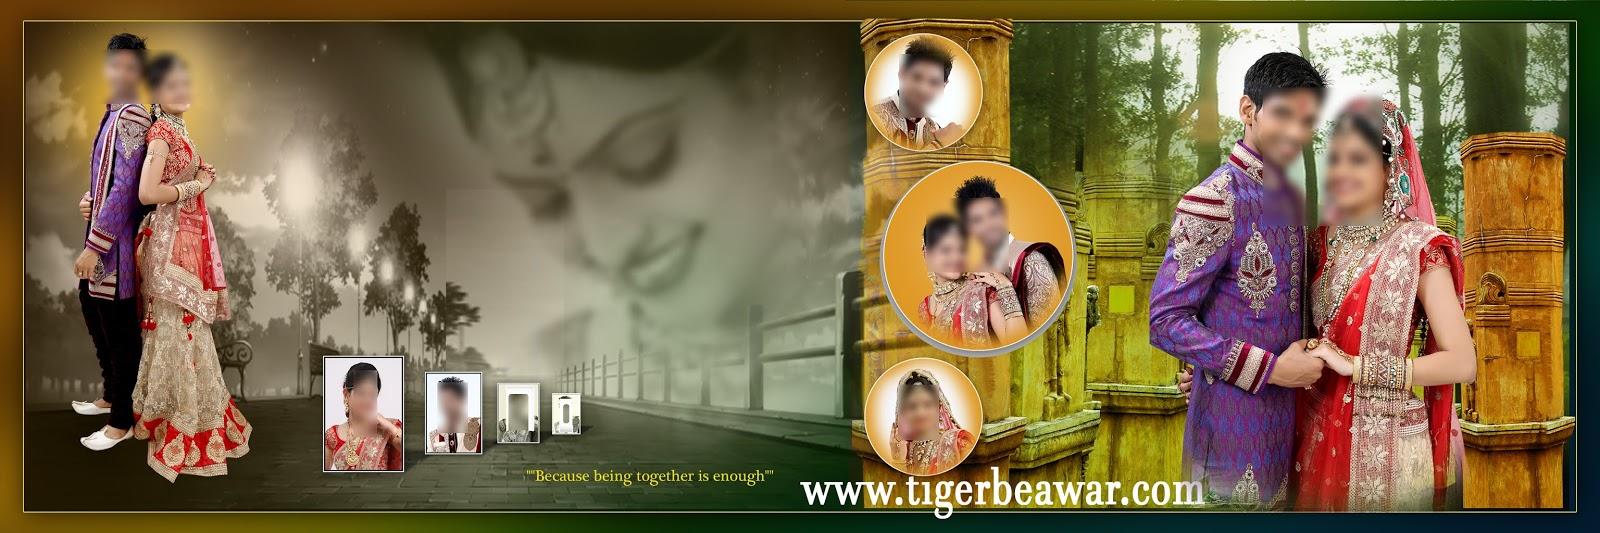 Indian 2020 Karizma Album Design 12x36 Psd Templates Free